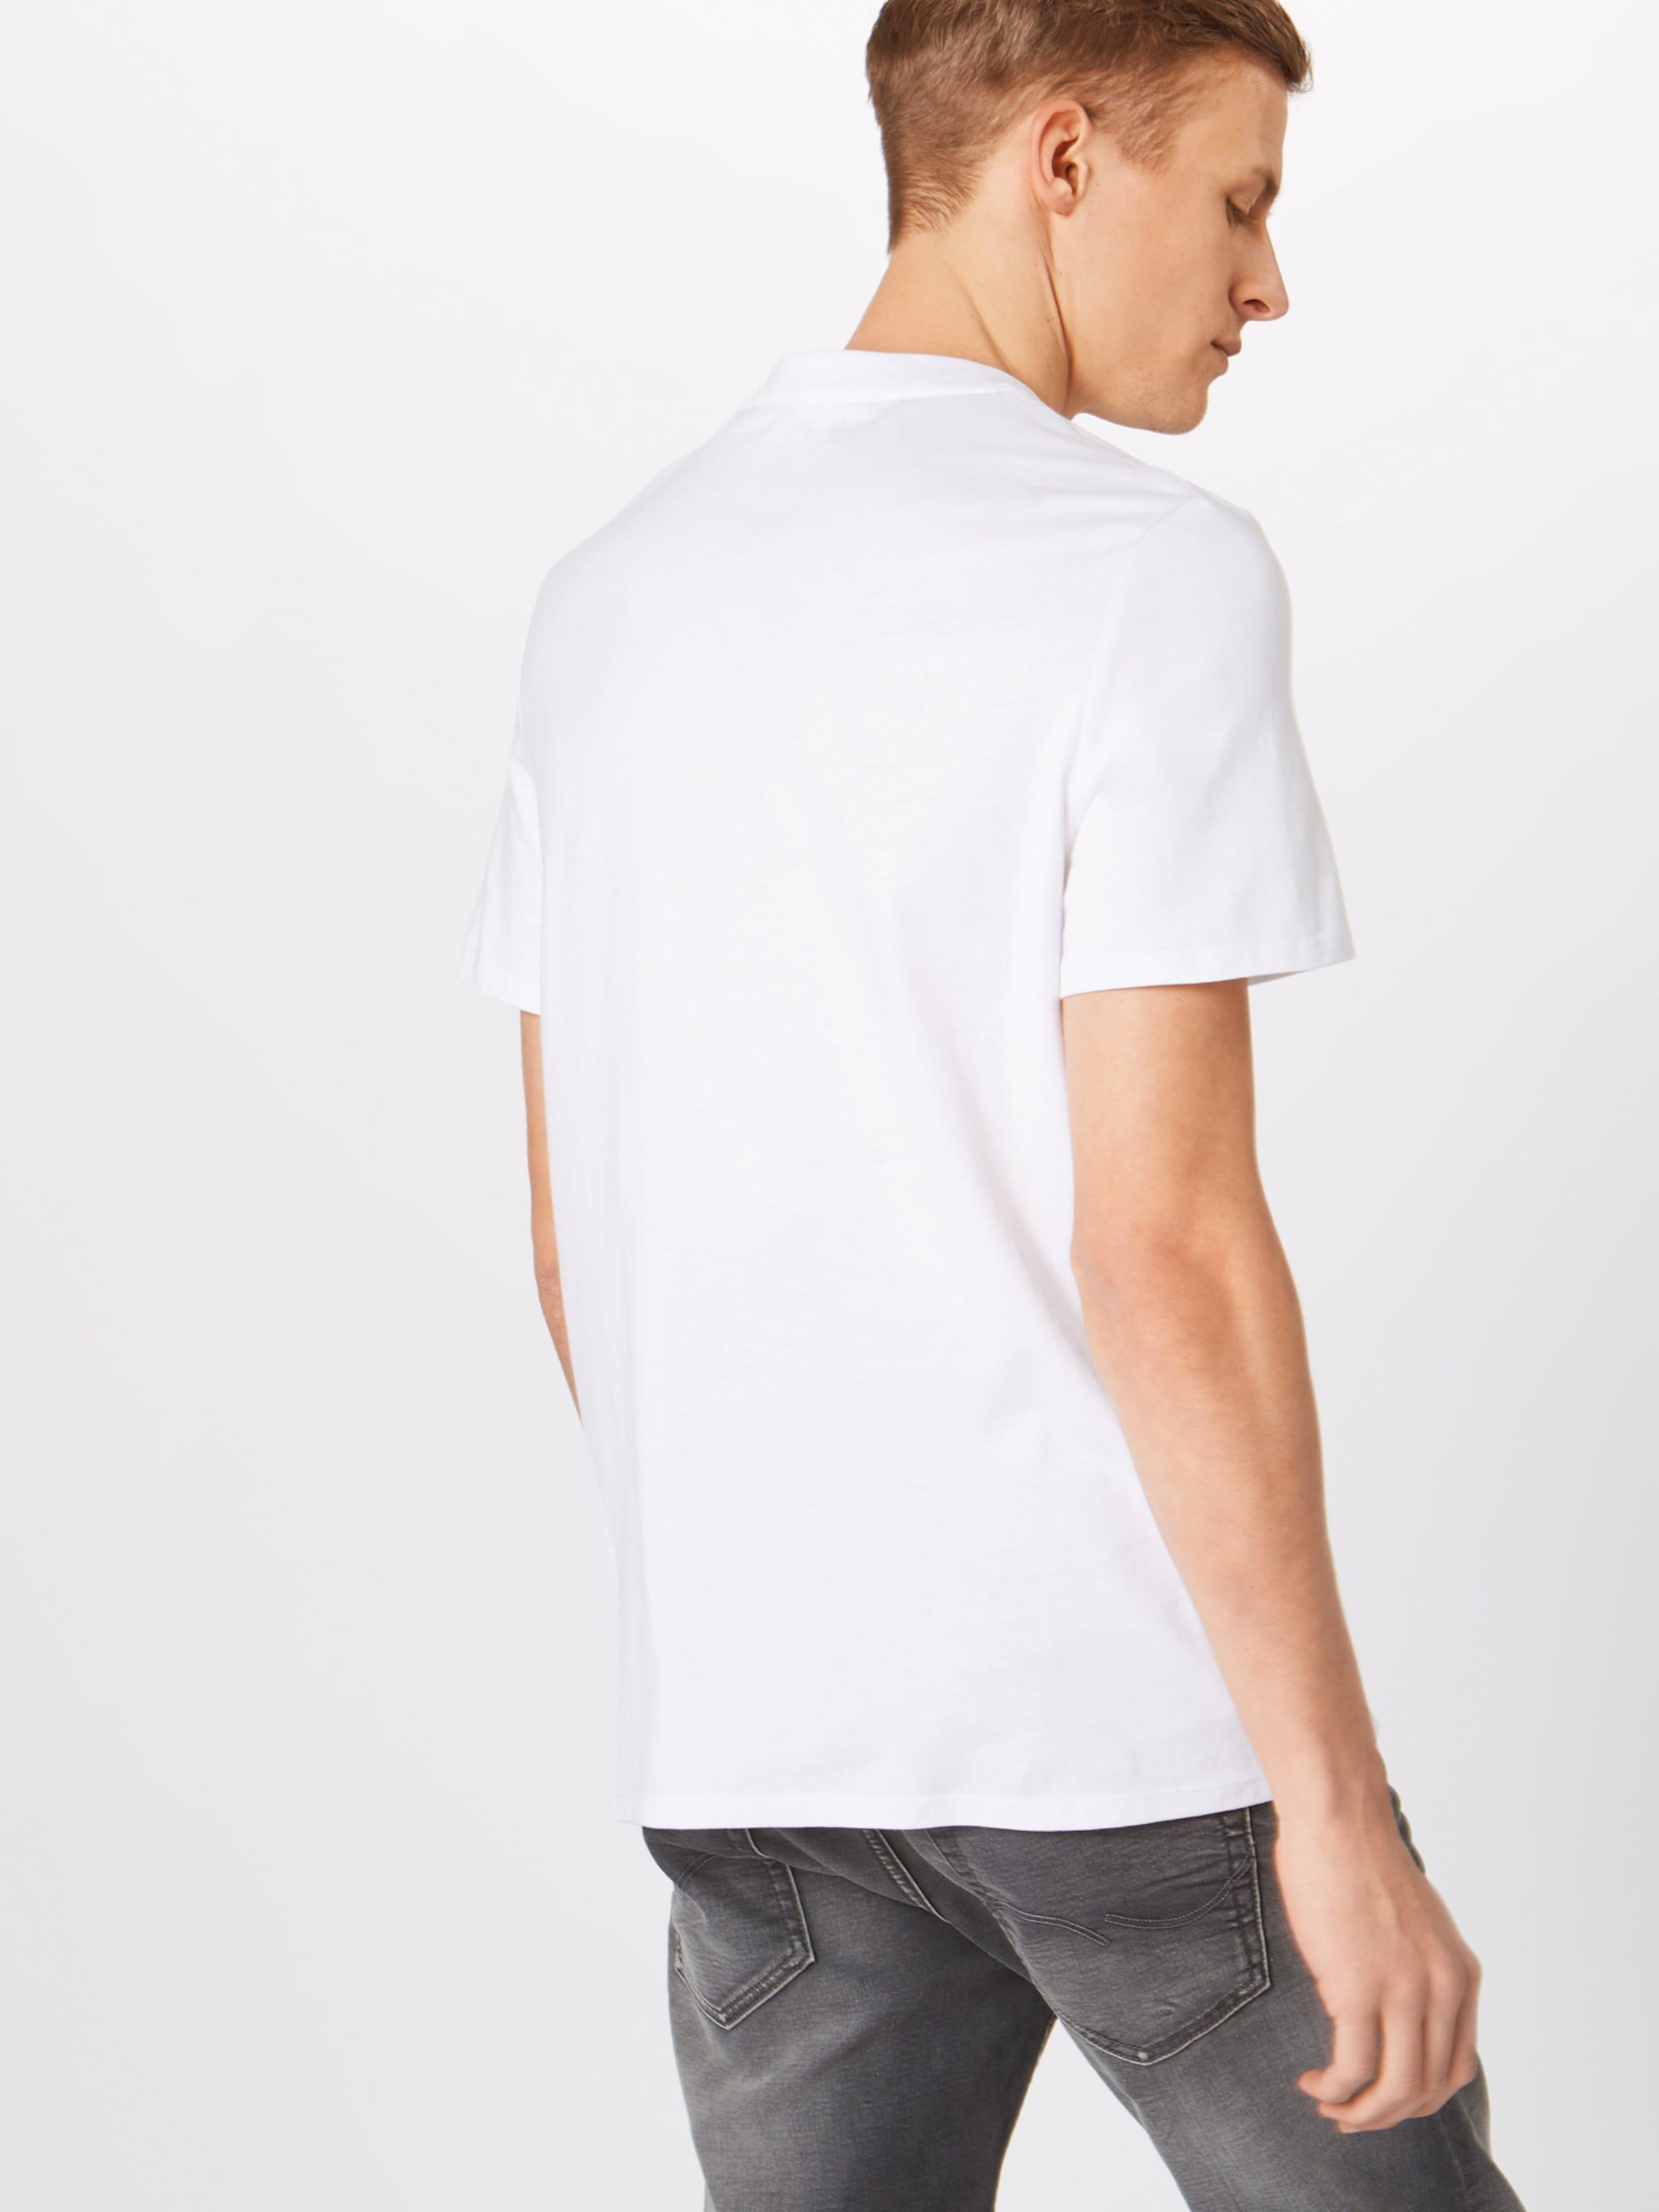 T T shirt Blanc En En Guess shirt Guess n08wvNOm